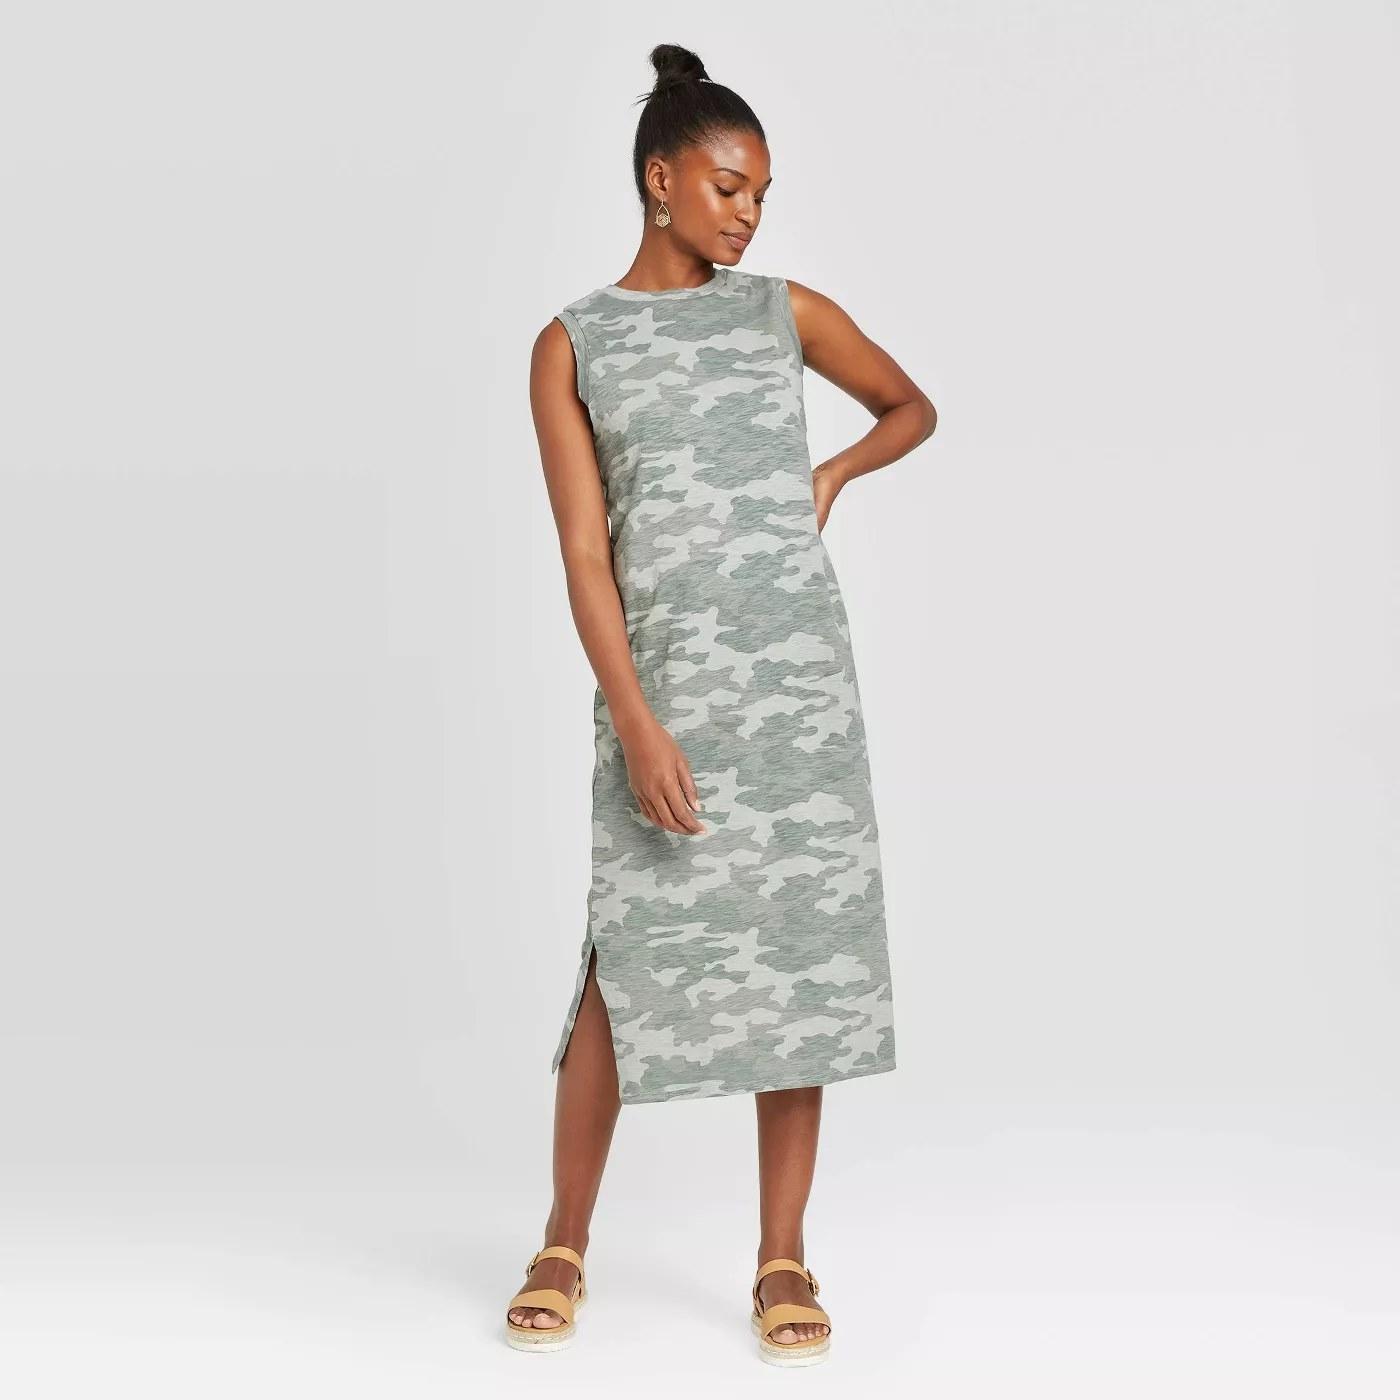 The sleeveless, midi dress in camo